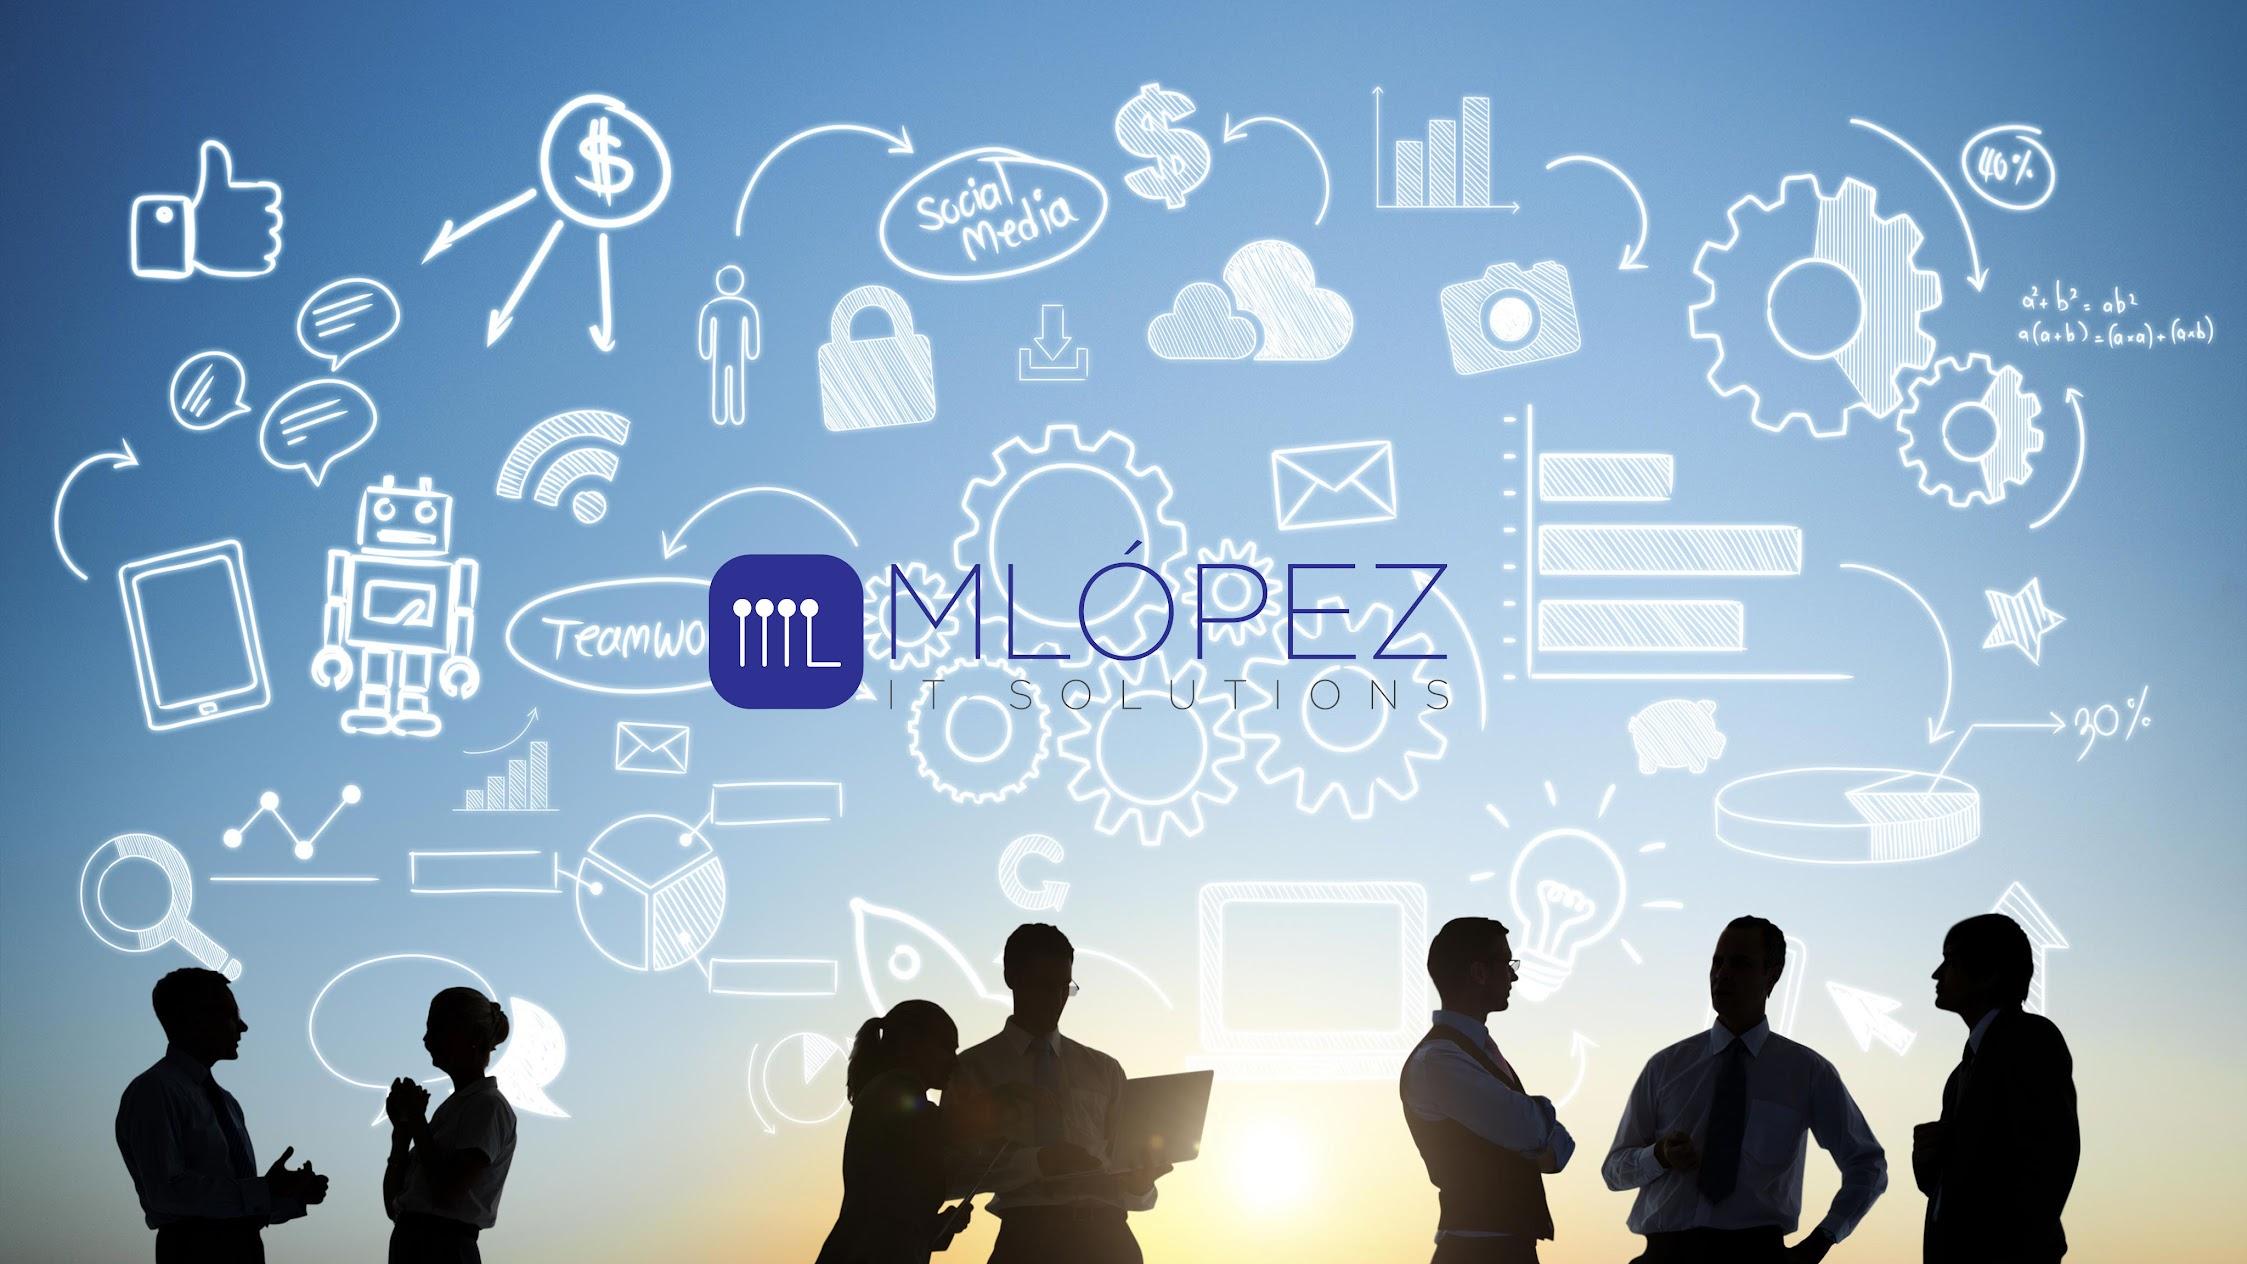 MLopez IT Solutions